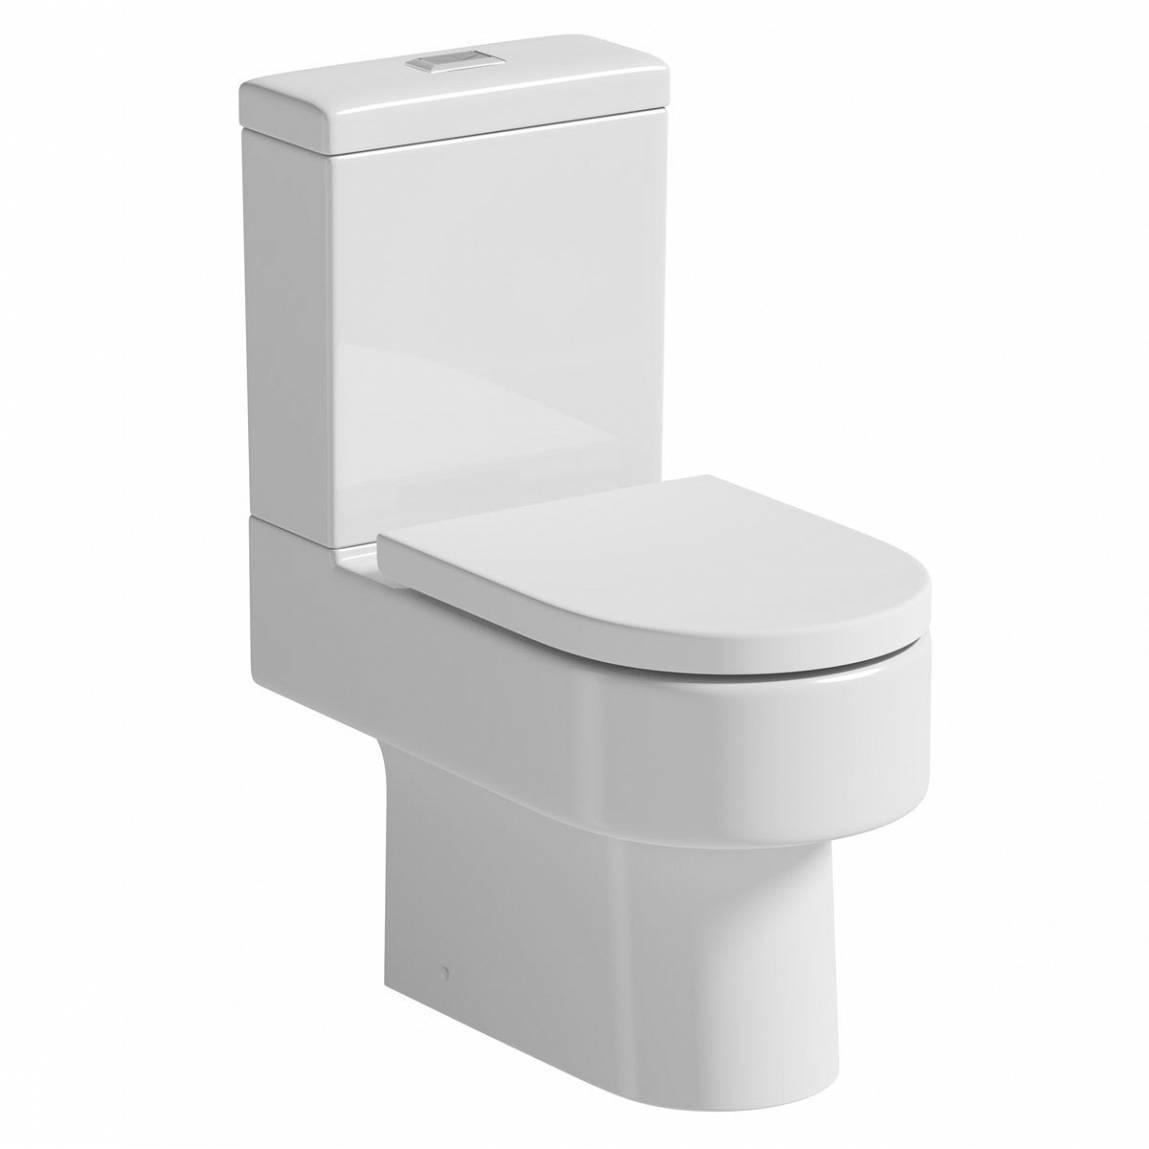 Image of Brooklyn Close Coupled Toilet inc Luxury Soft Close Seat PLUS Pushfit Valve